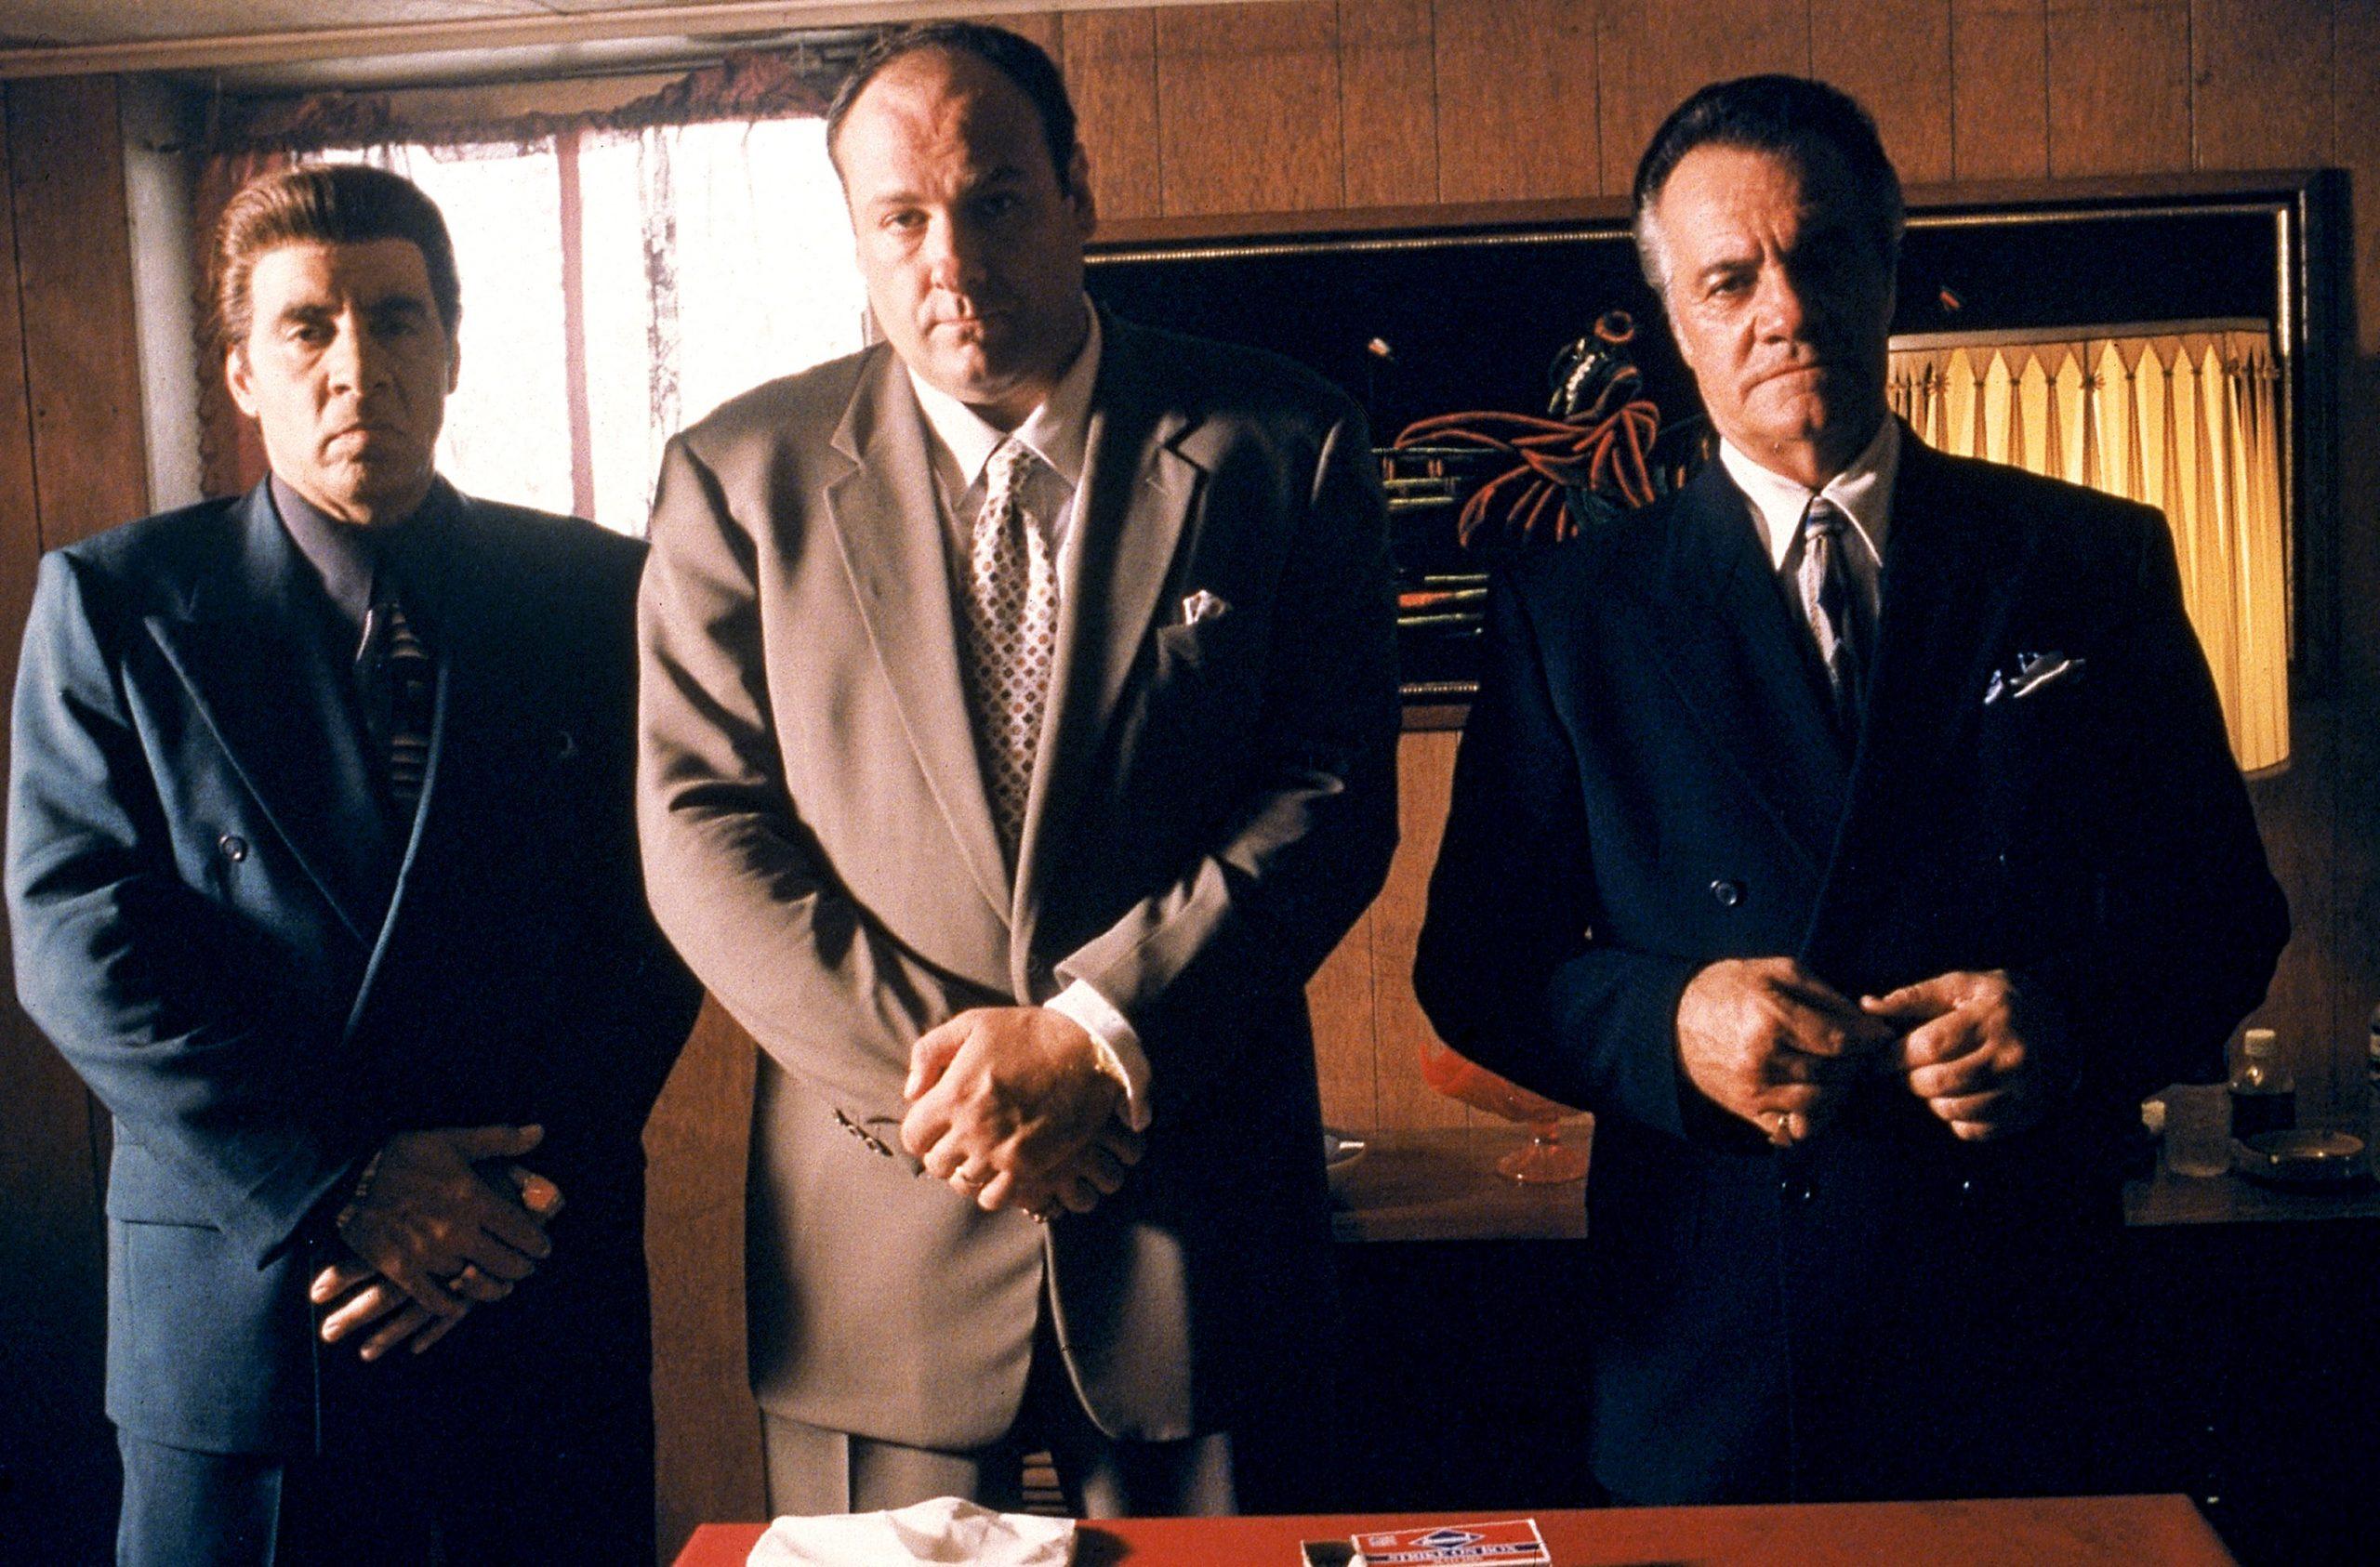 Tony, Paulie, and Silvio